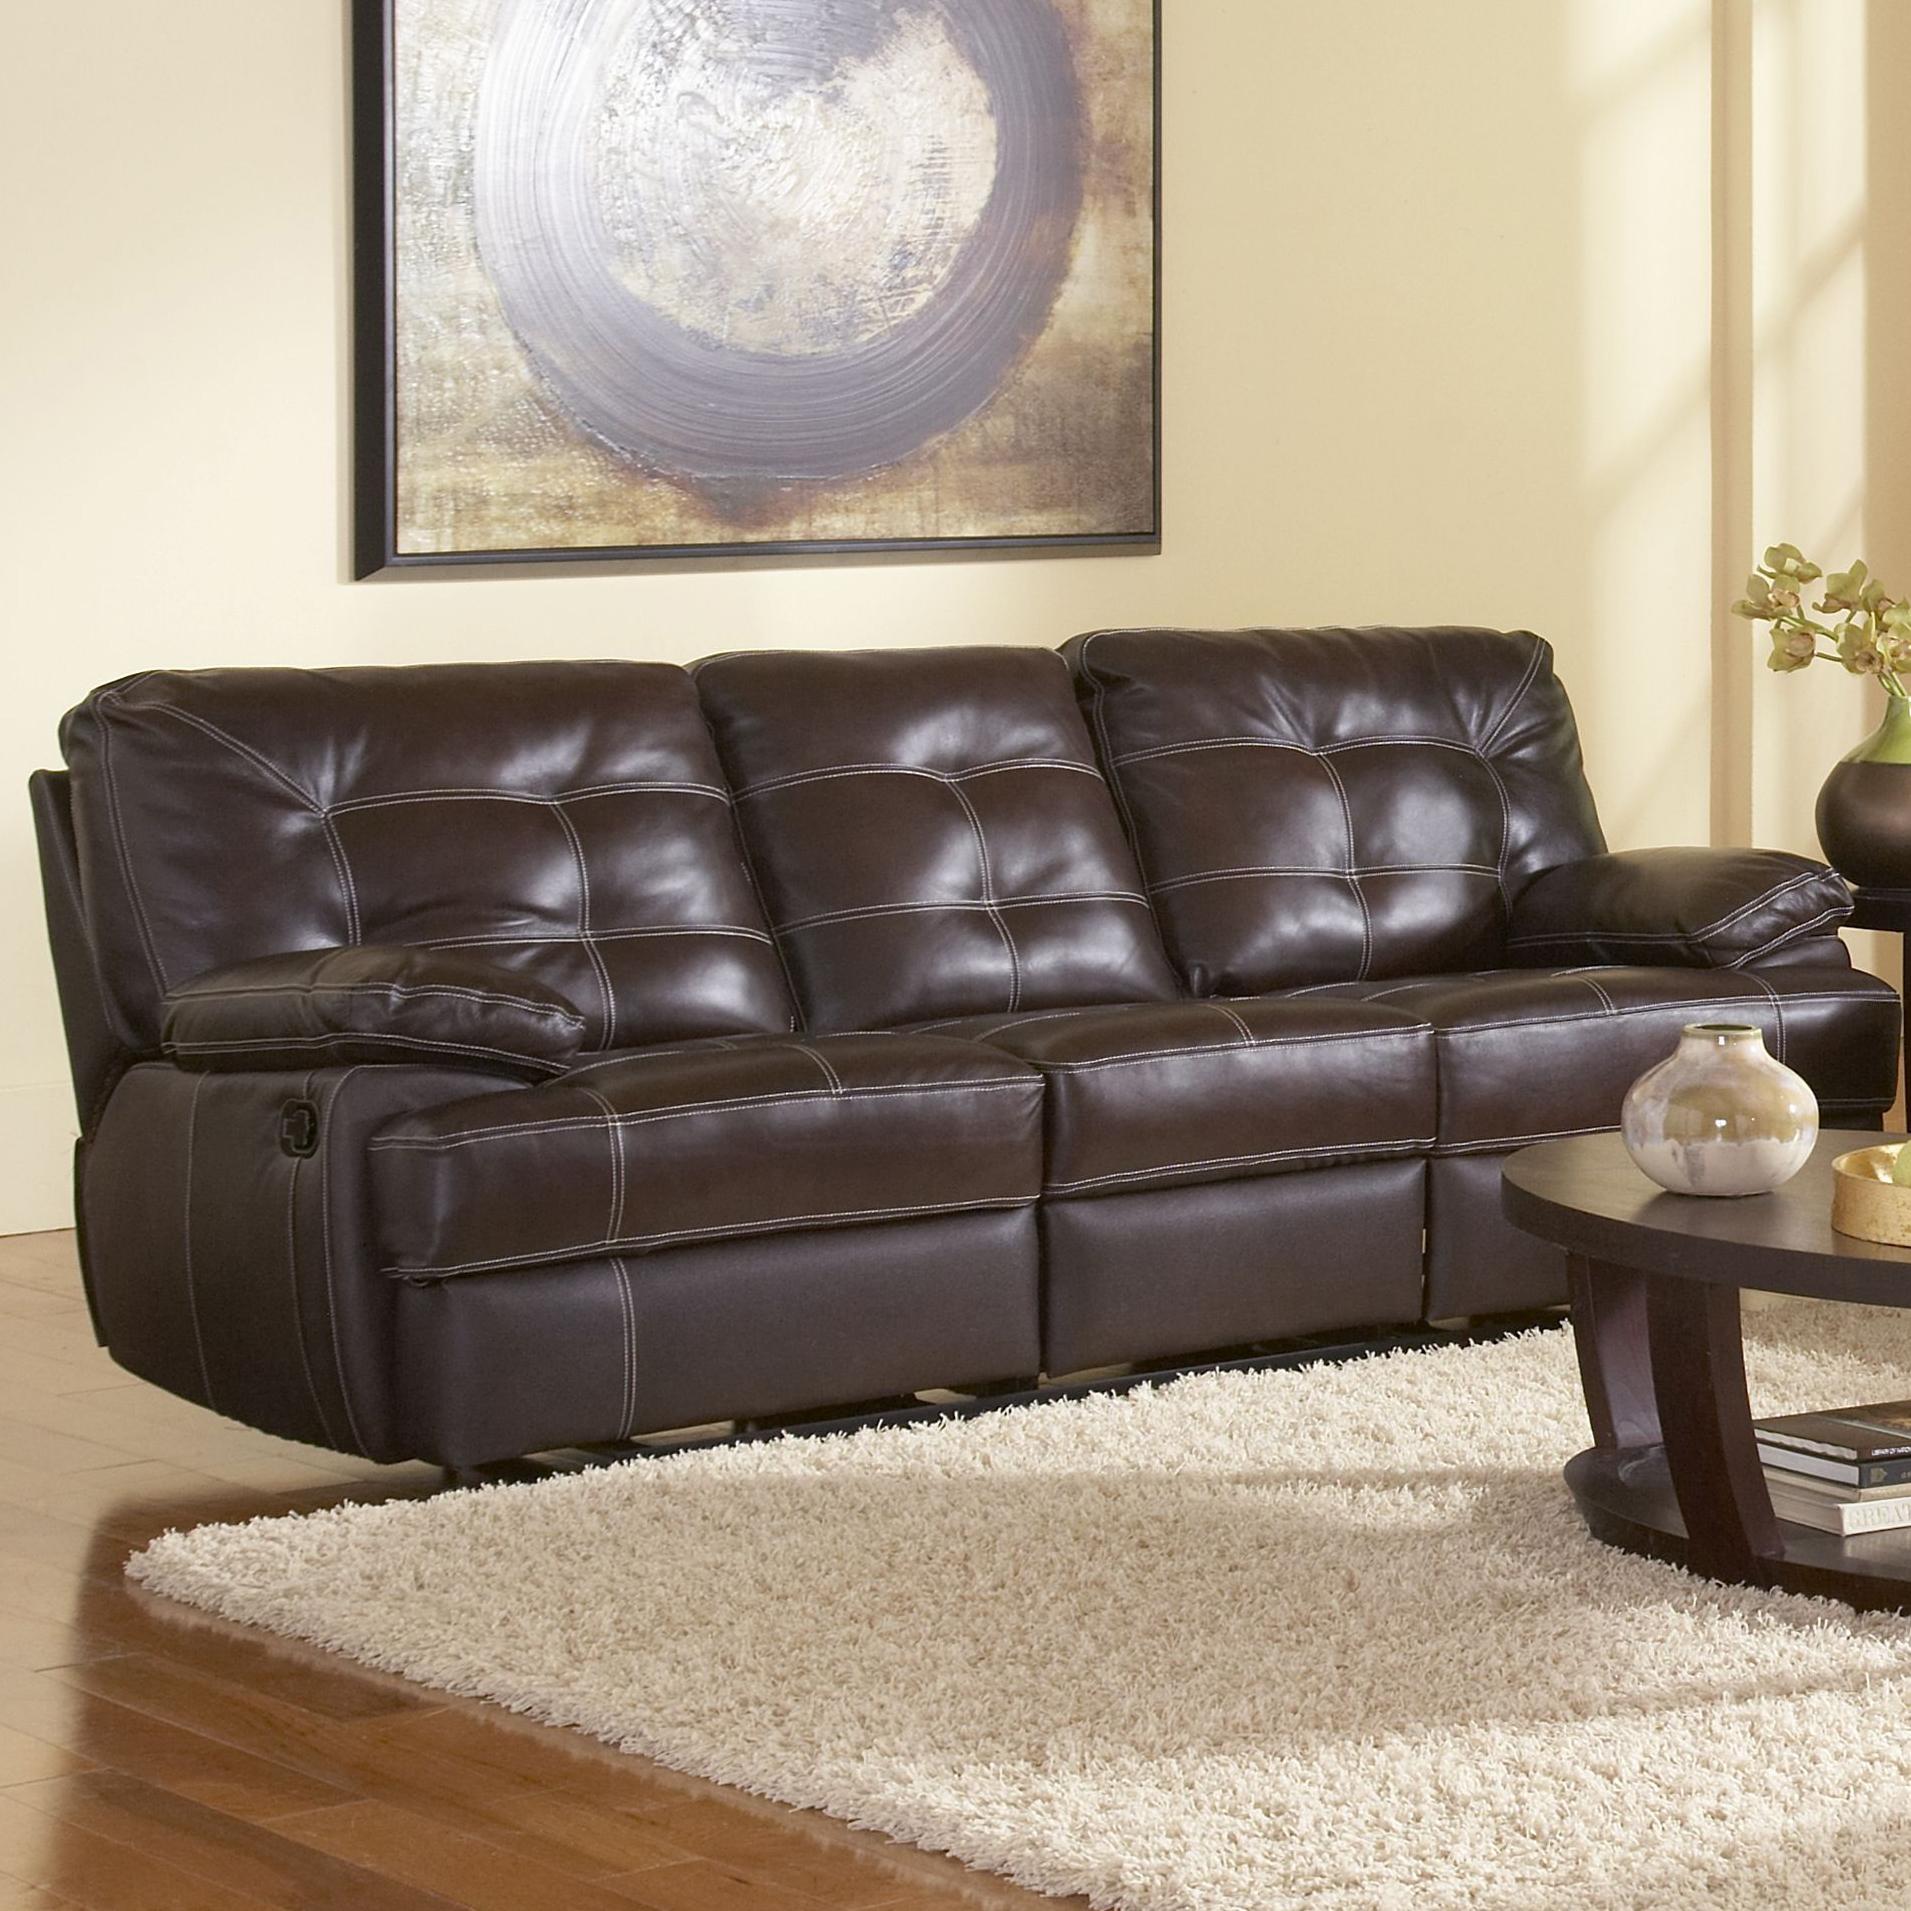 Leather Italia USA Dalton Contemporary Reclining Sofa With Contrast  Stitching